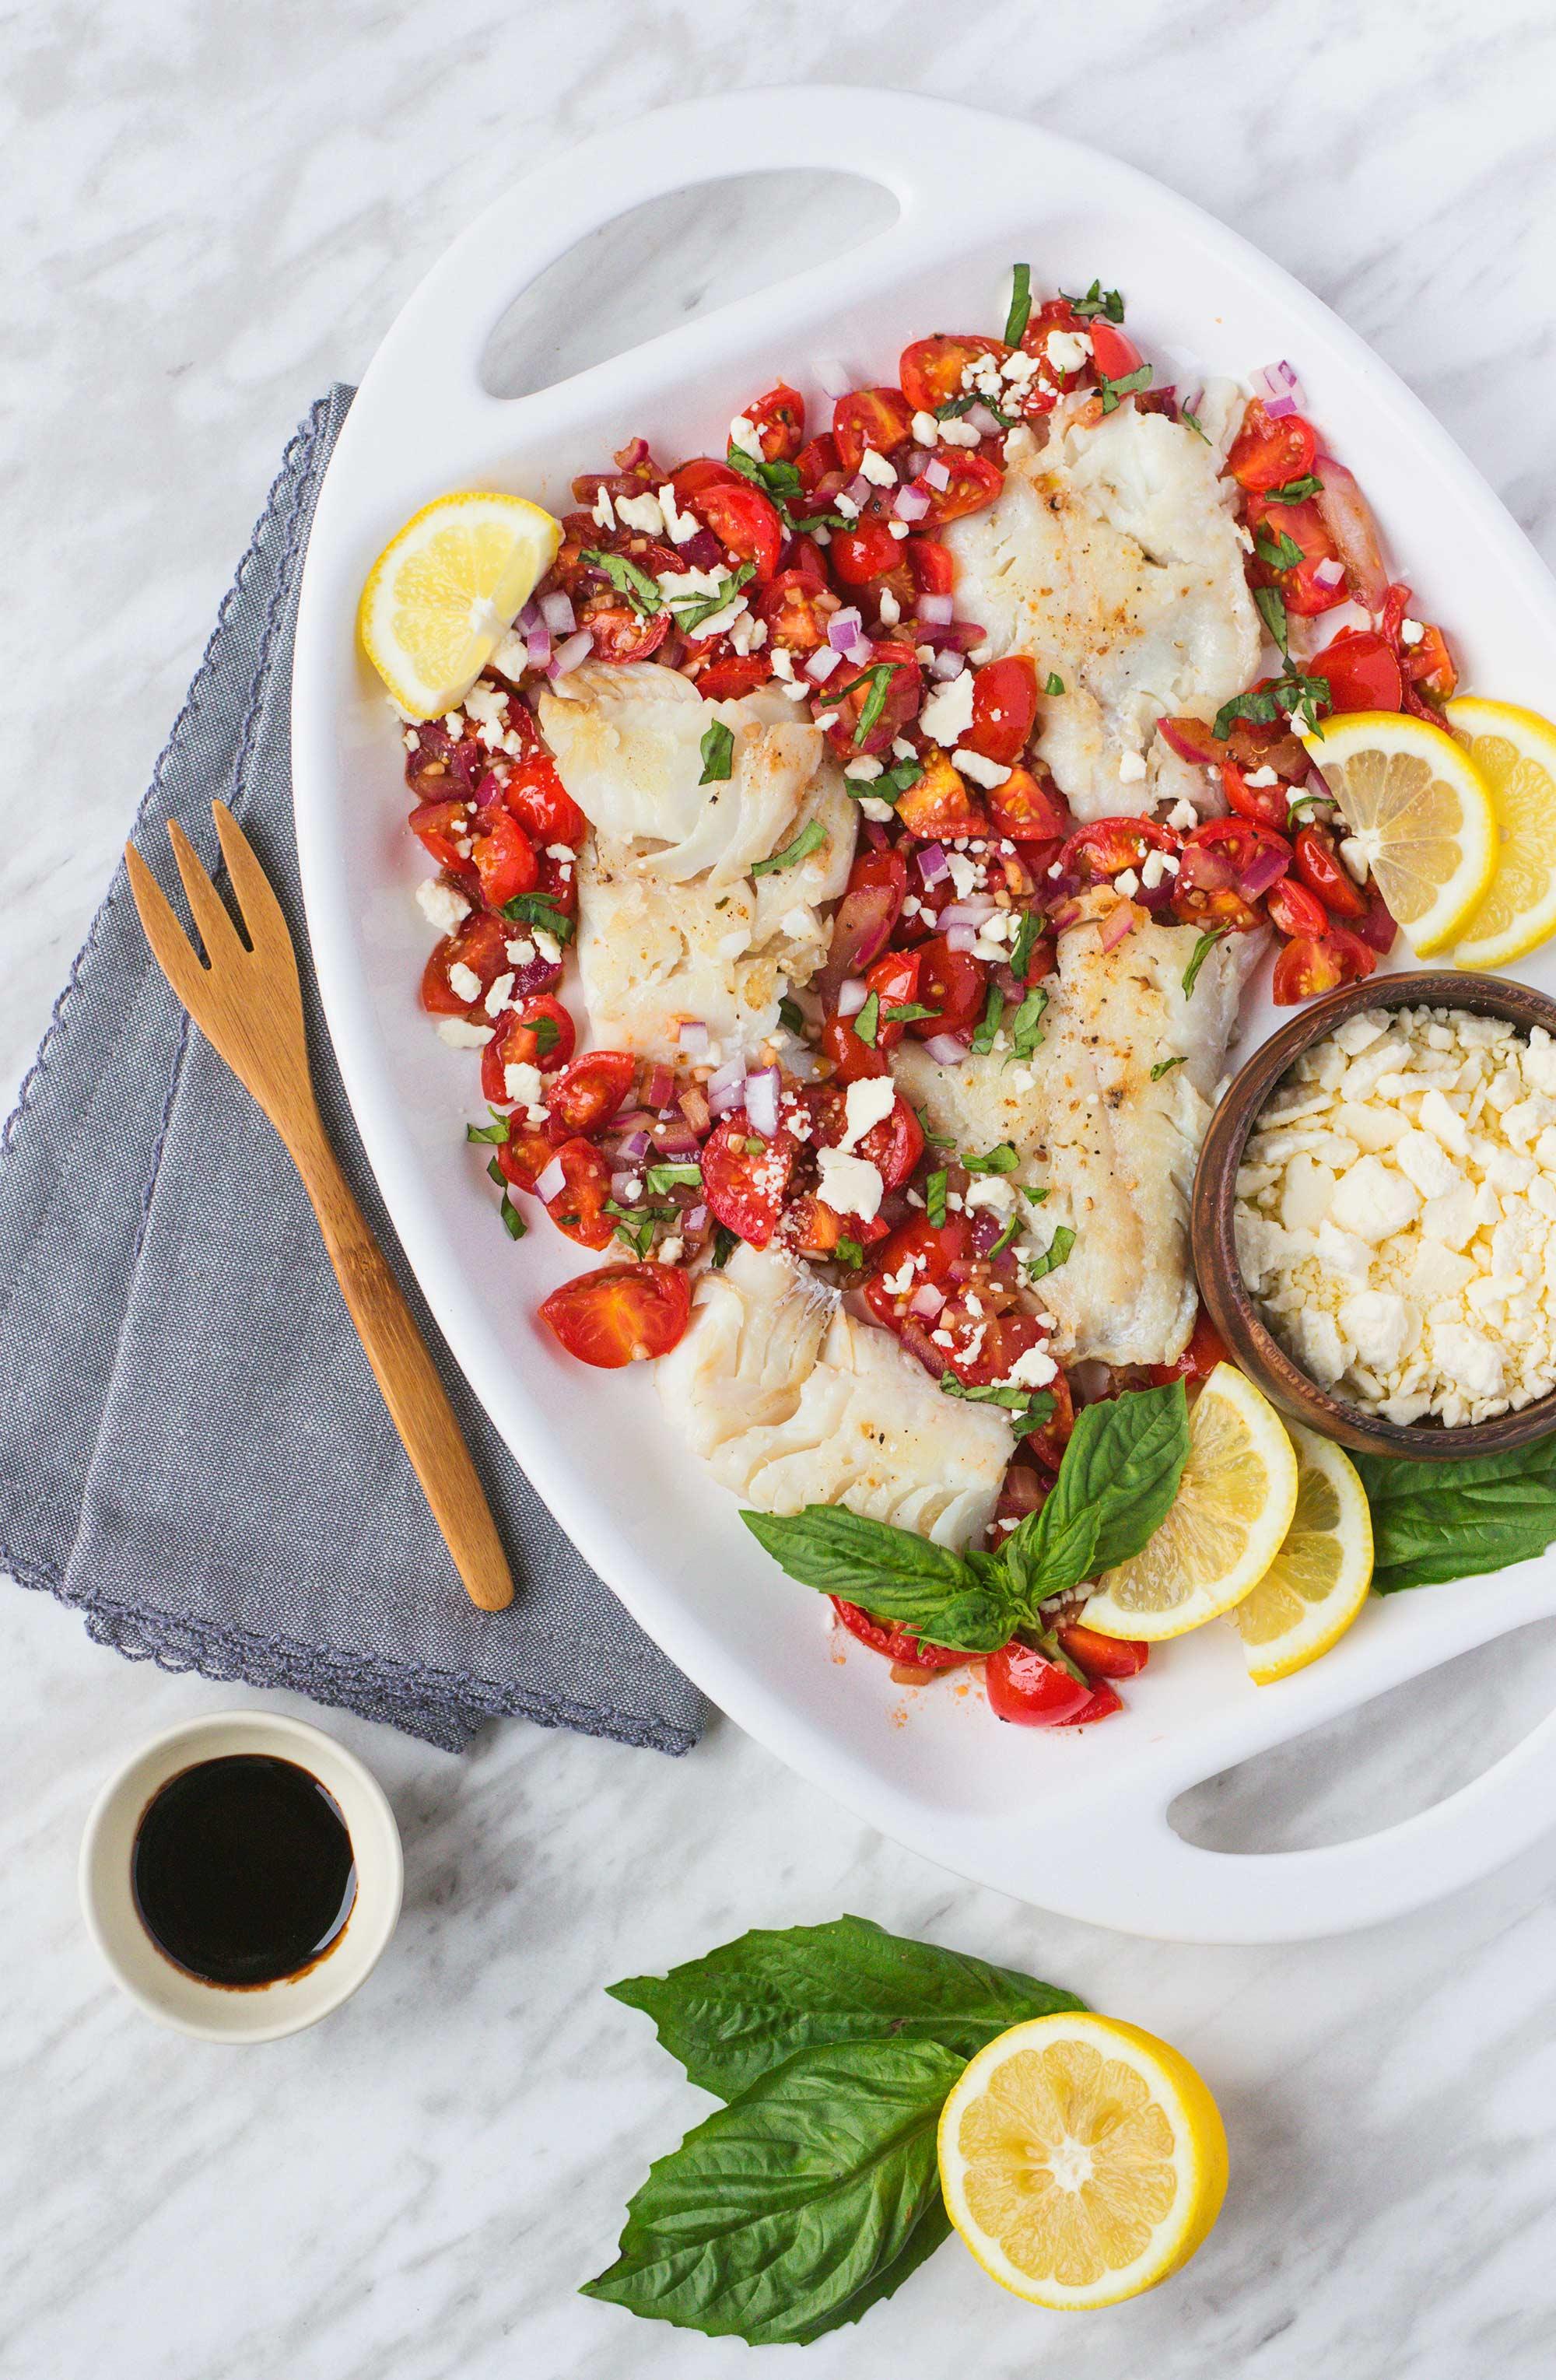 Greta Podleski's Mediterranean Fish Dish